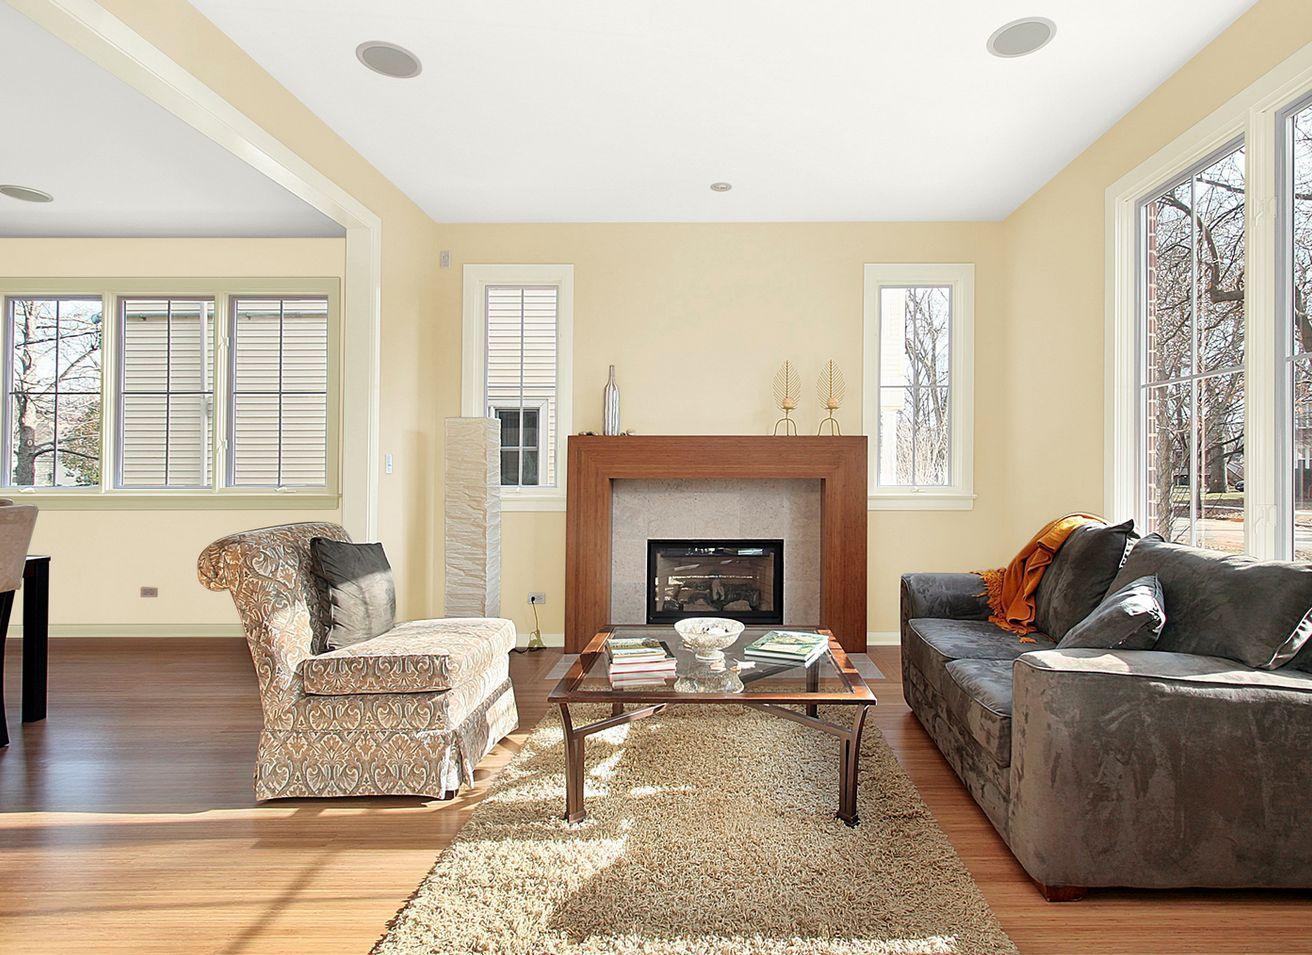 Interior design home painting - What Is The Best Home Depot Paint Behr Glidden Or Ralph Lauren